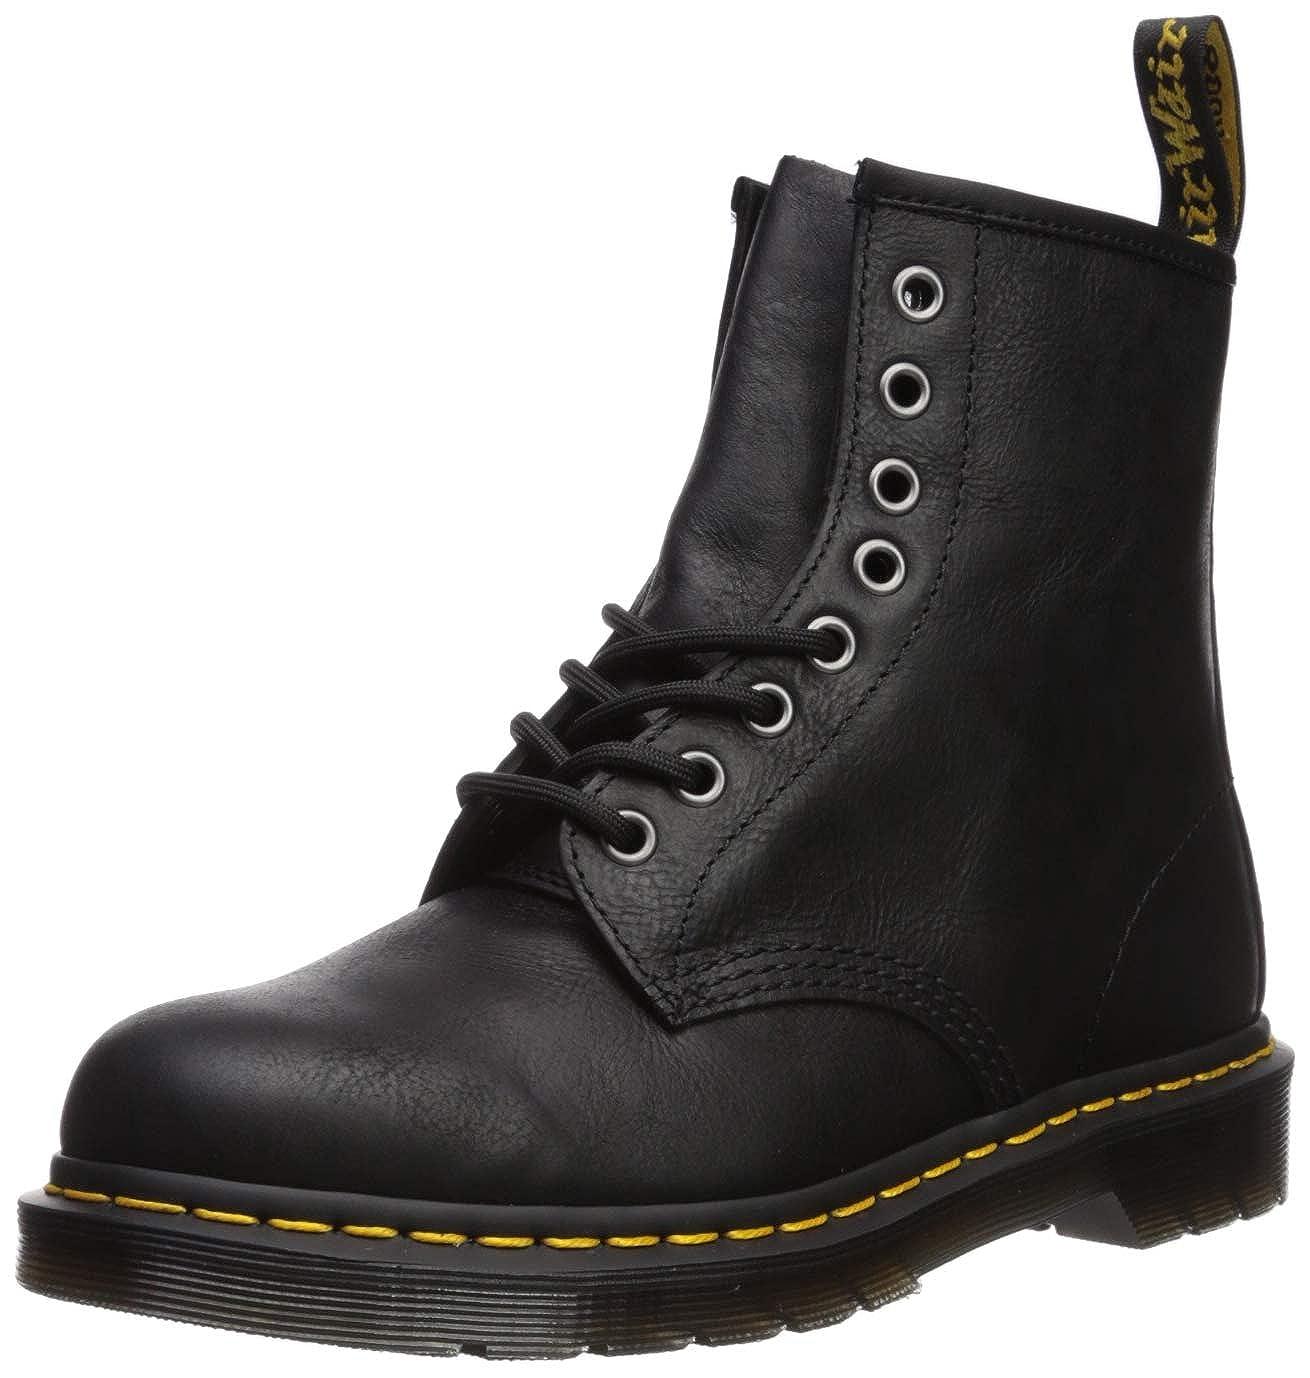 d72b35936fe Dr. Martens Men's 1460 Carpathian Combat Boot